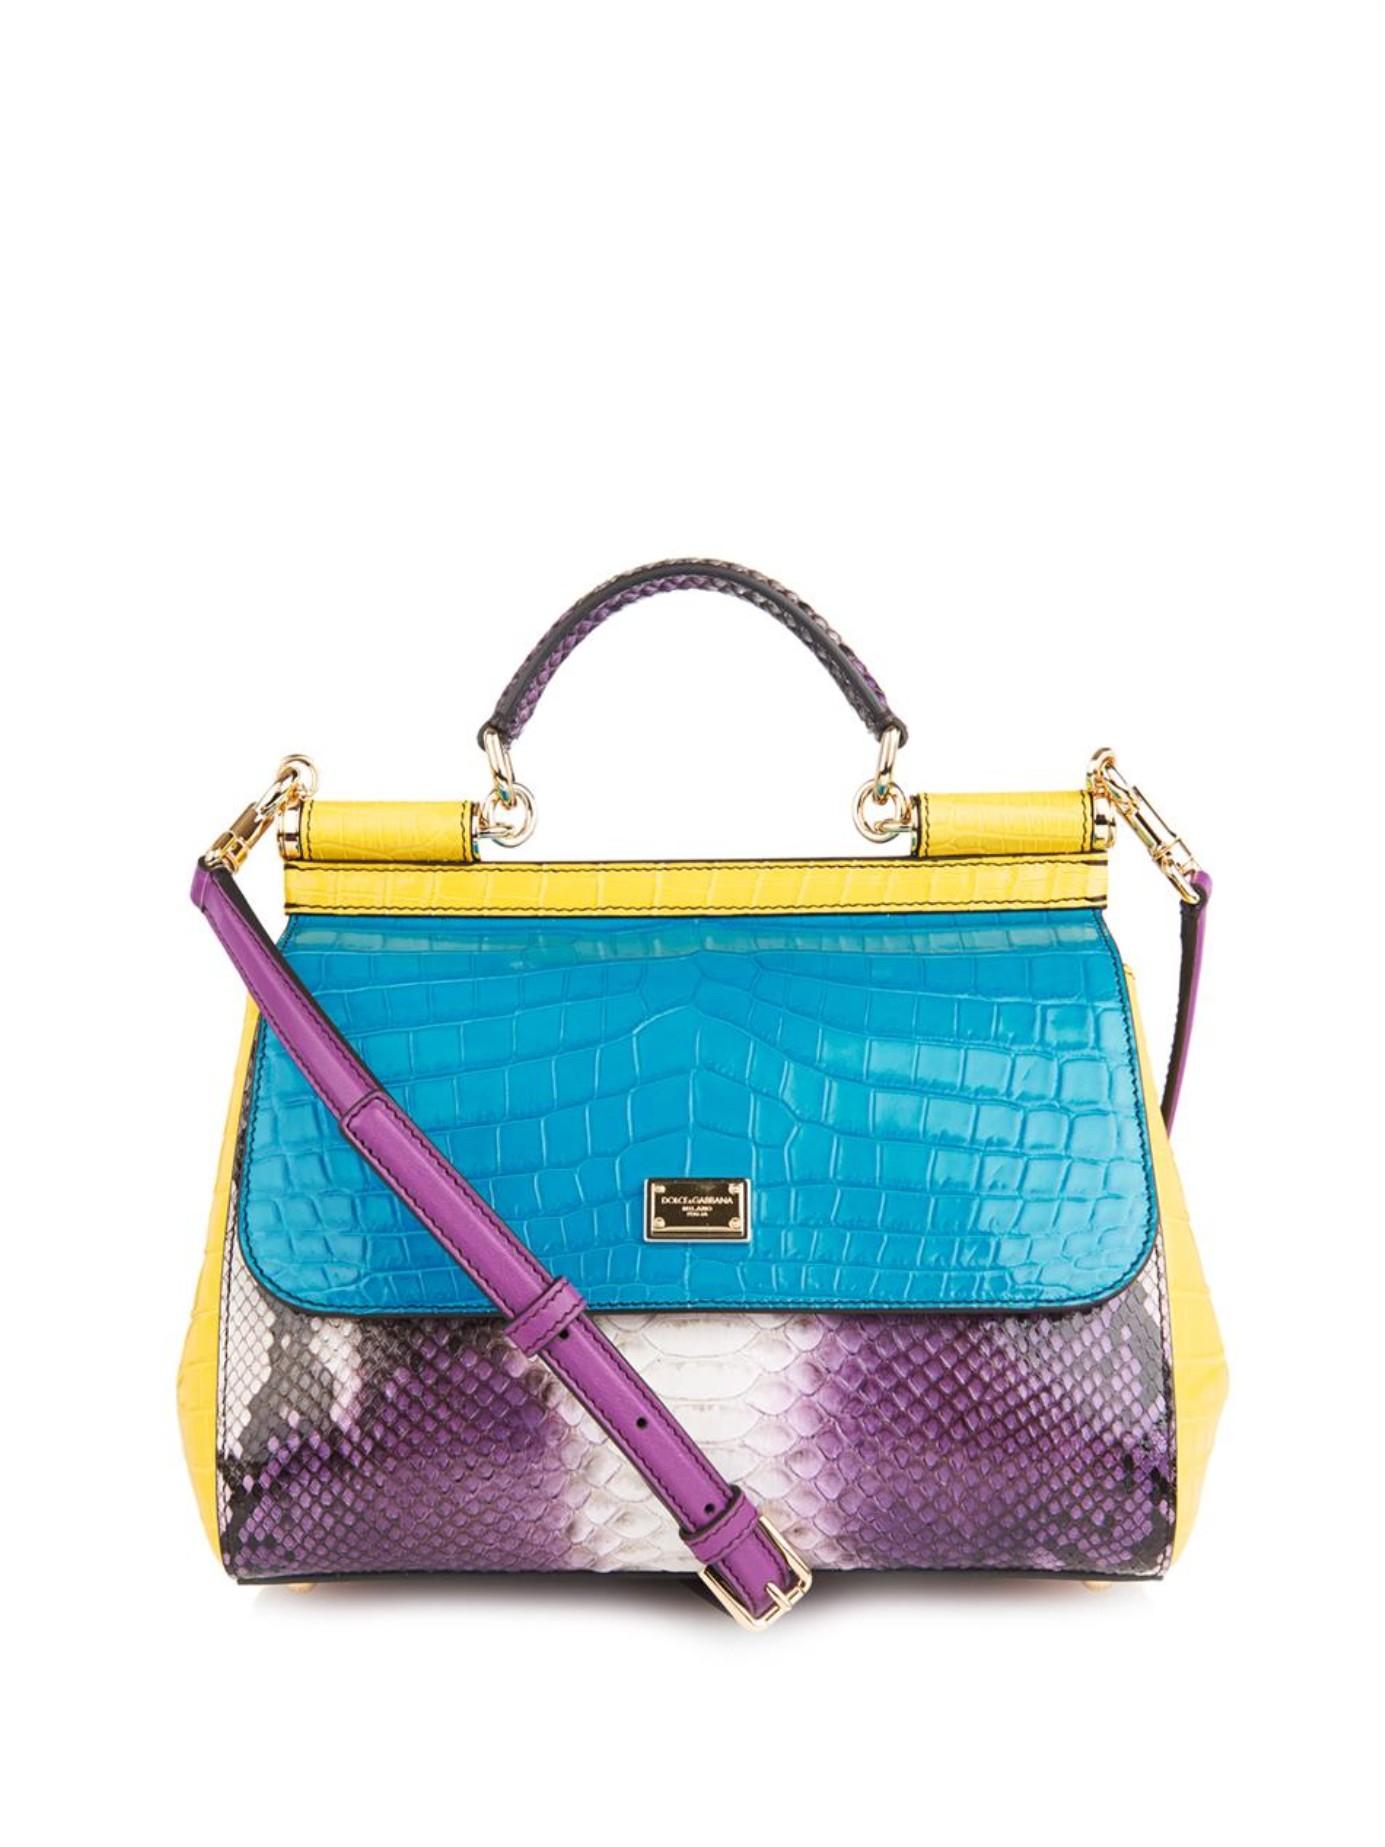 902907851e Lyst - Dolce   Gabbana Sicily Crocodile And Snake Cross-body Bag